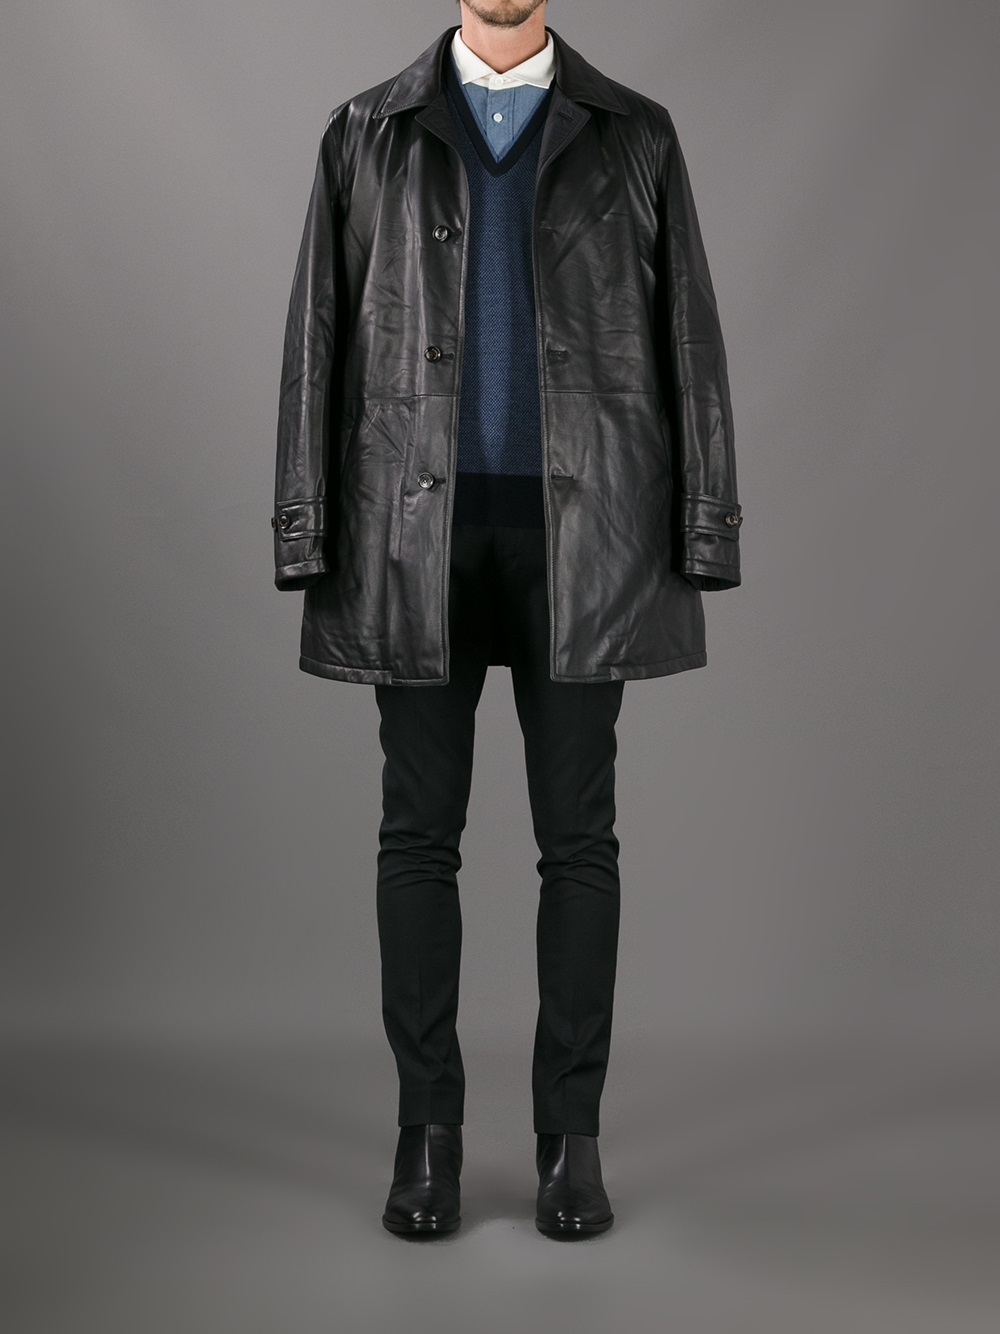 8544cb7b Ermenegildo Zegna Black Classic Leather Jacket for men